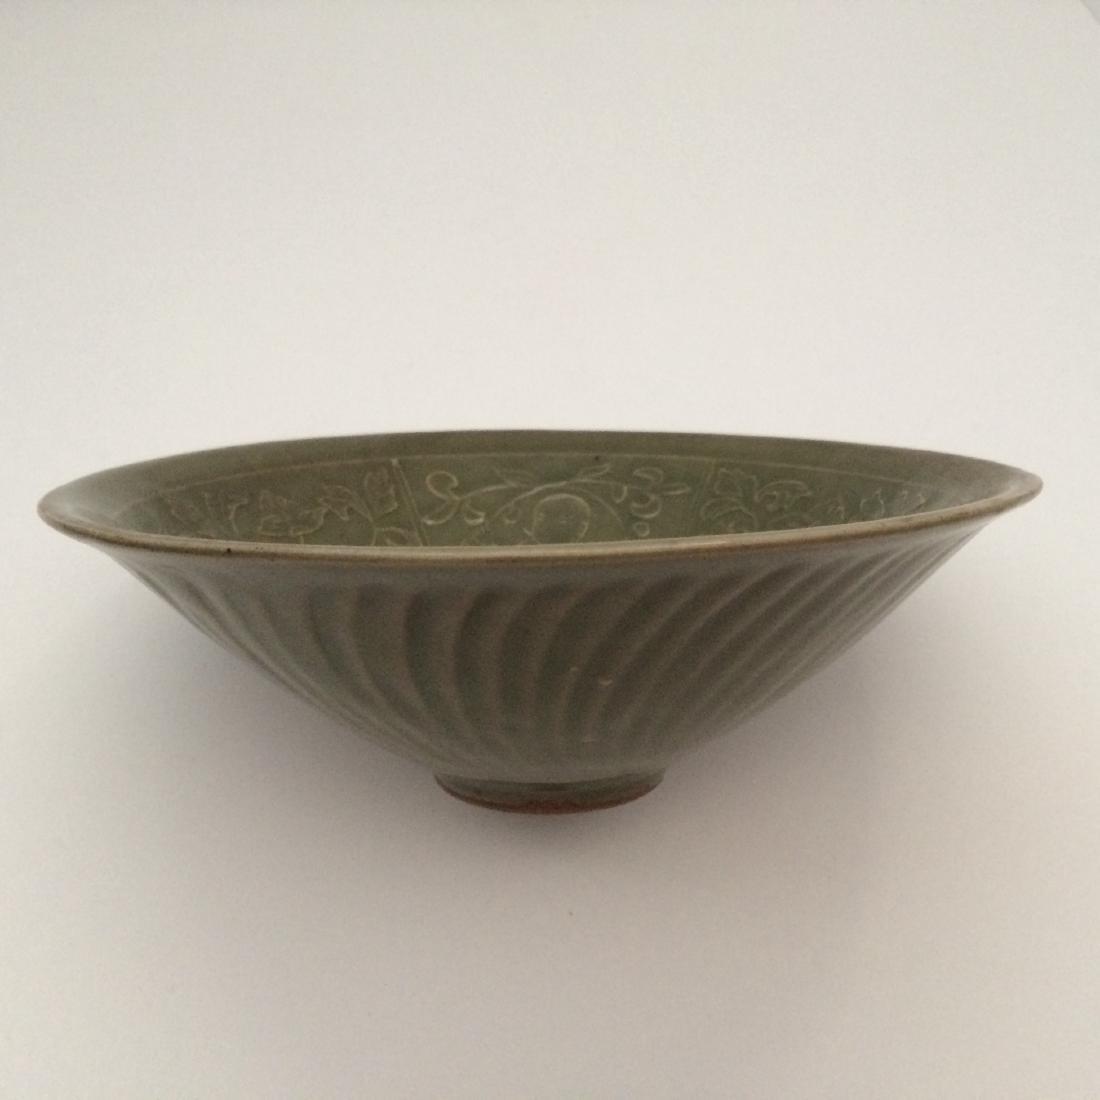 "Chinese Antique Yaozhou Ware Celadon Bowl (7.5""Dia)"